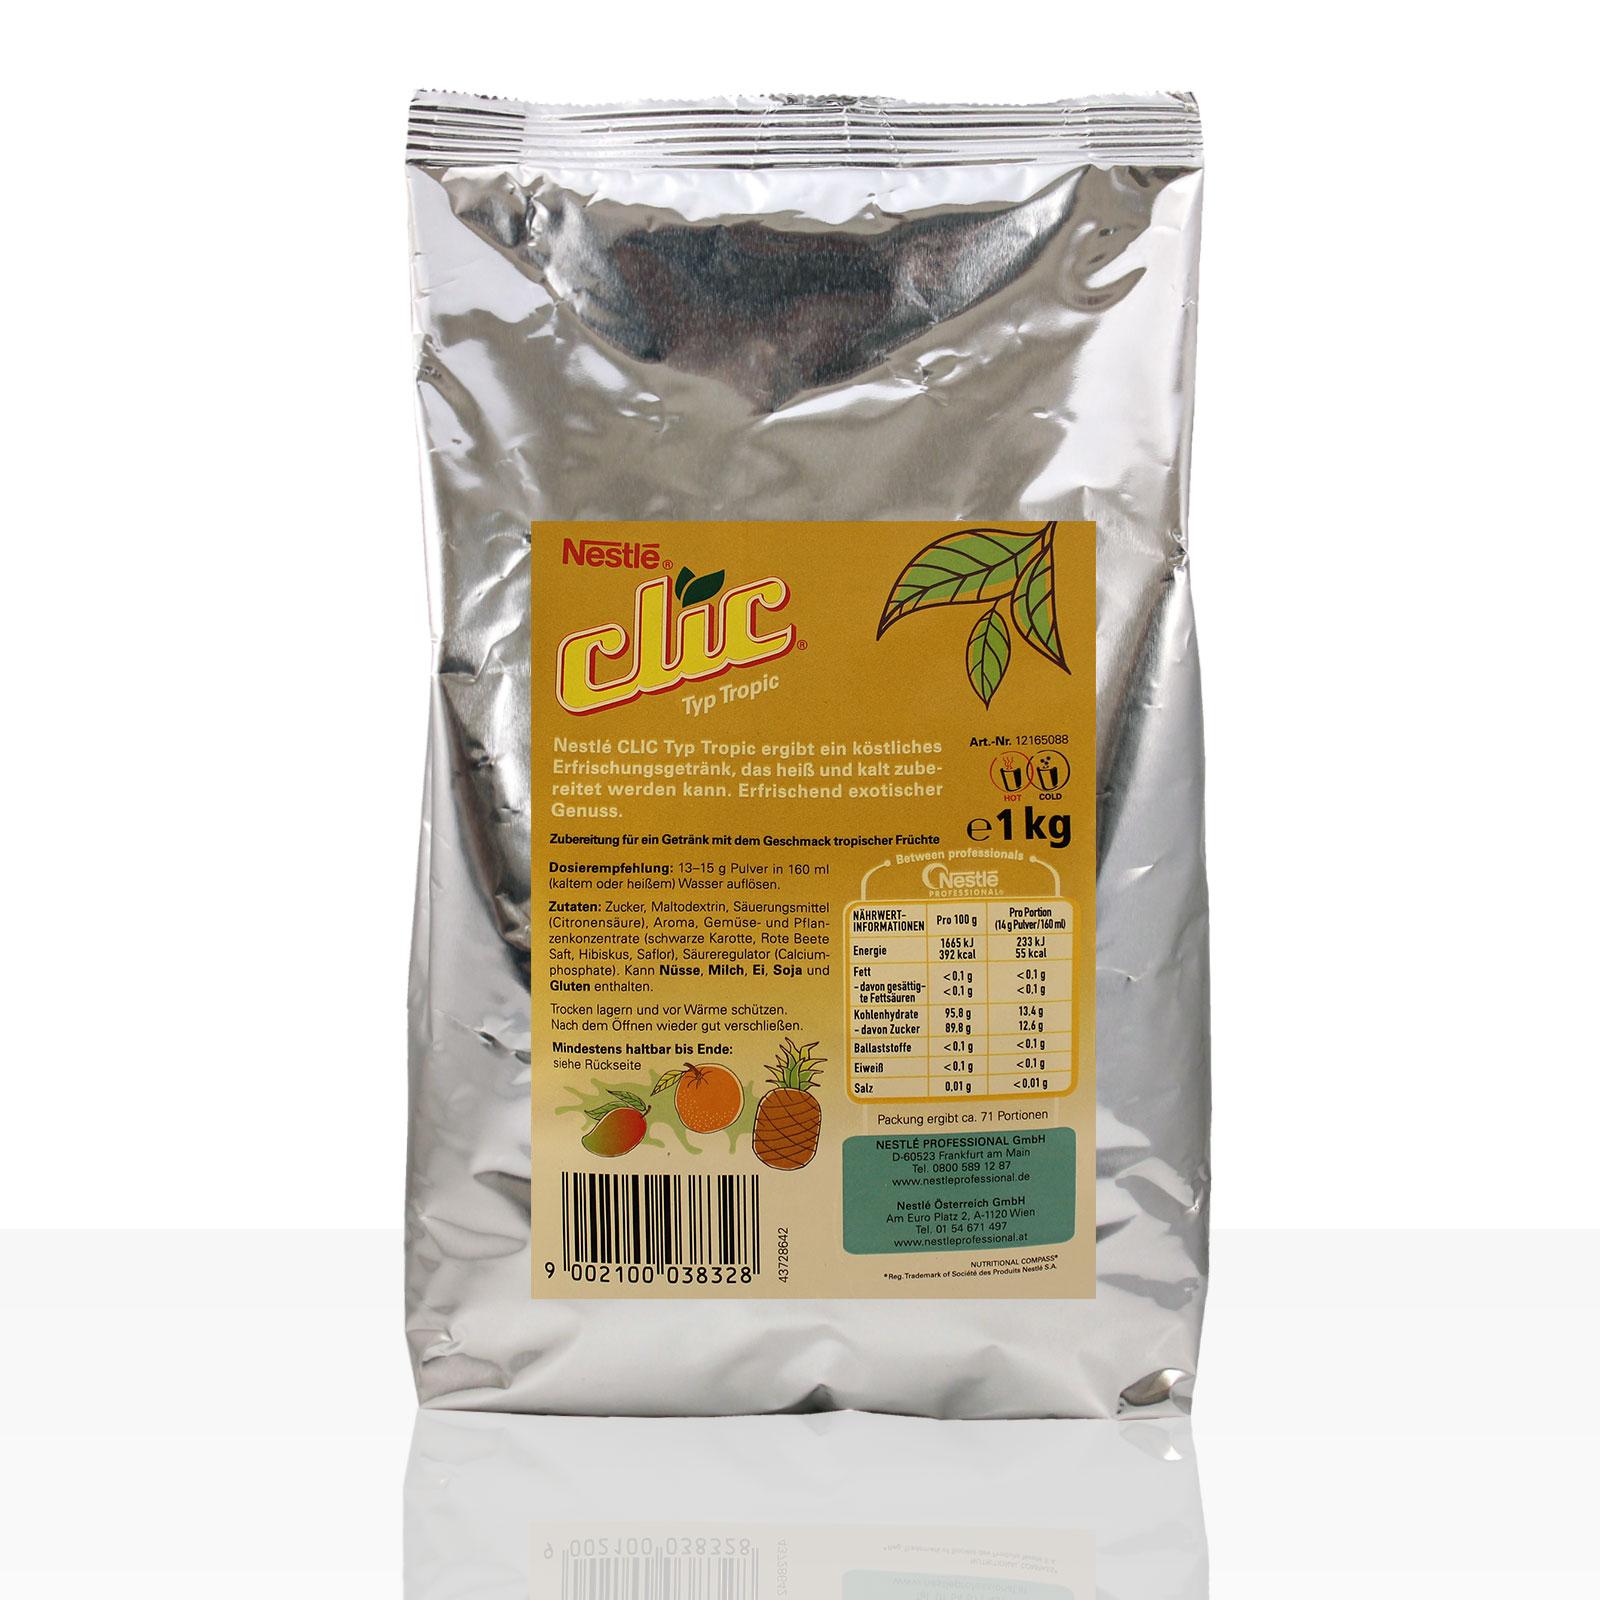 Nestlé Clic Tee Typ Tropic 1kg Instanttee - kurzes MHD